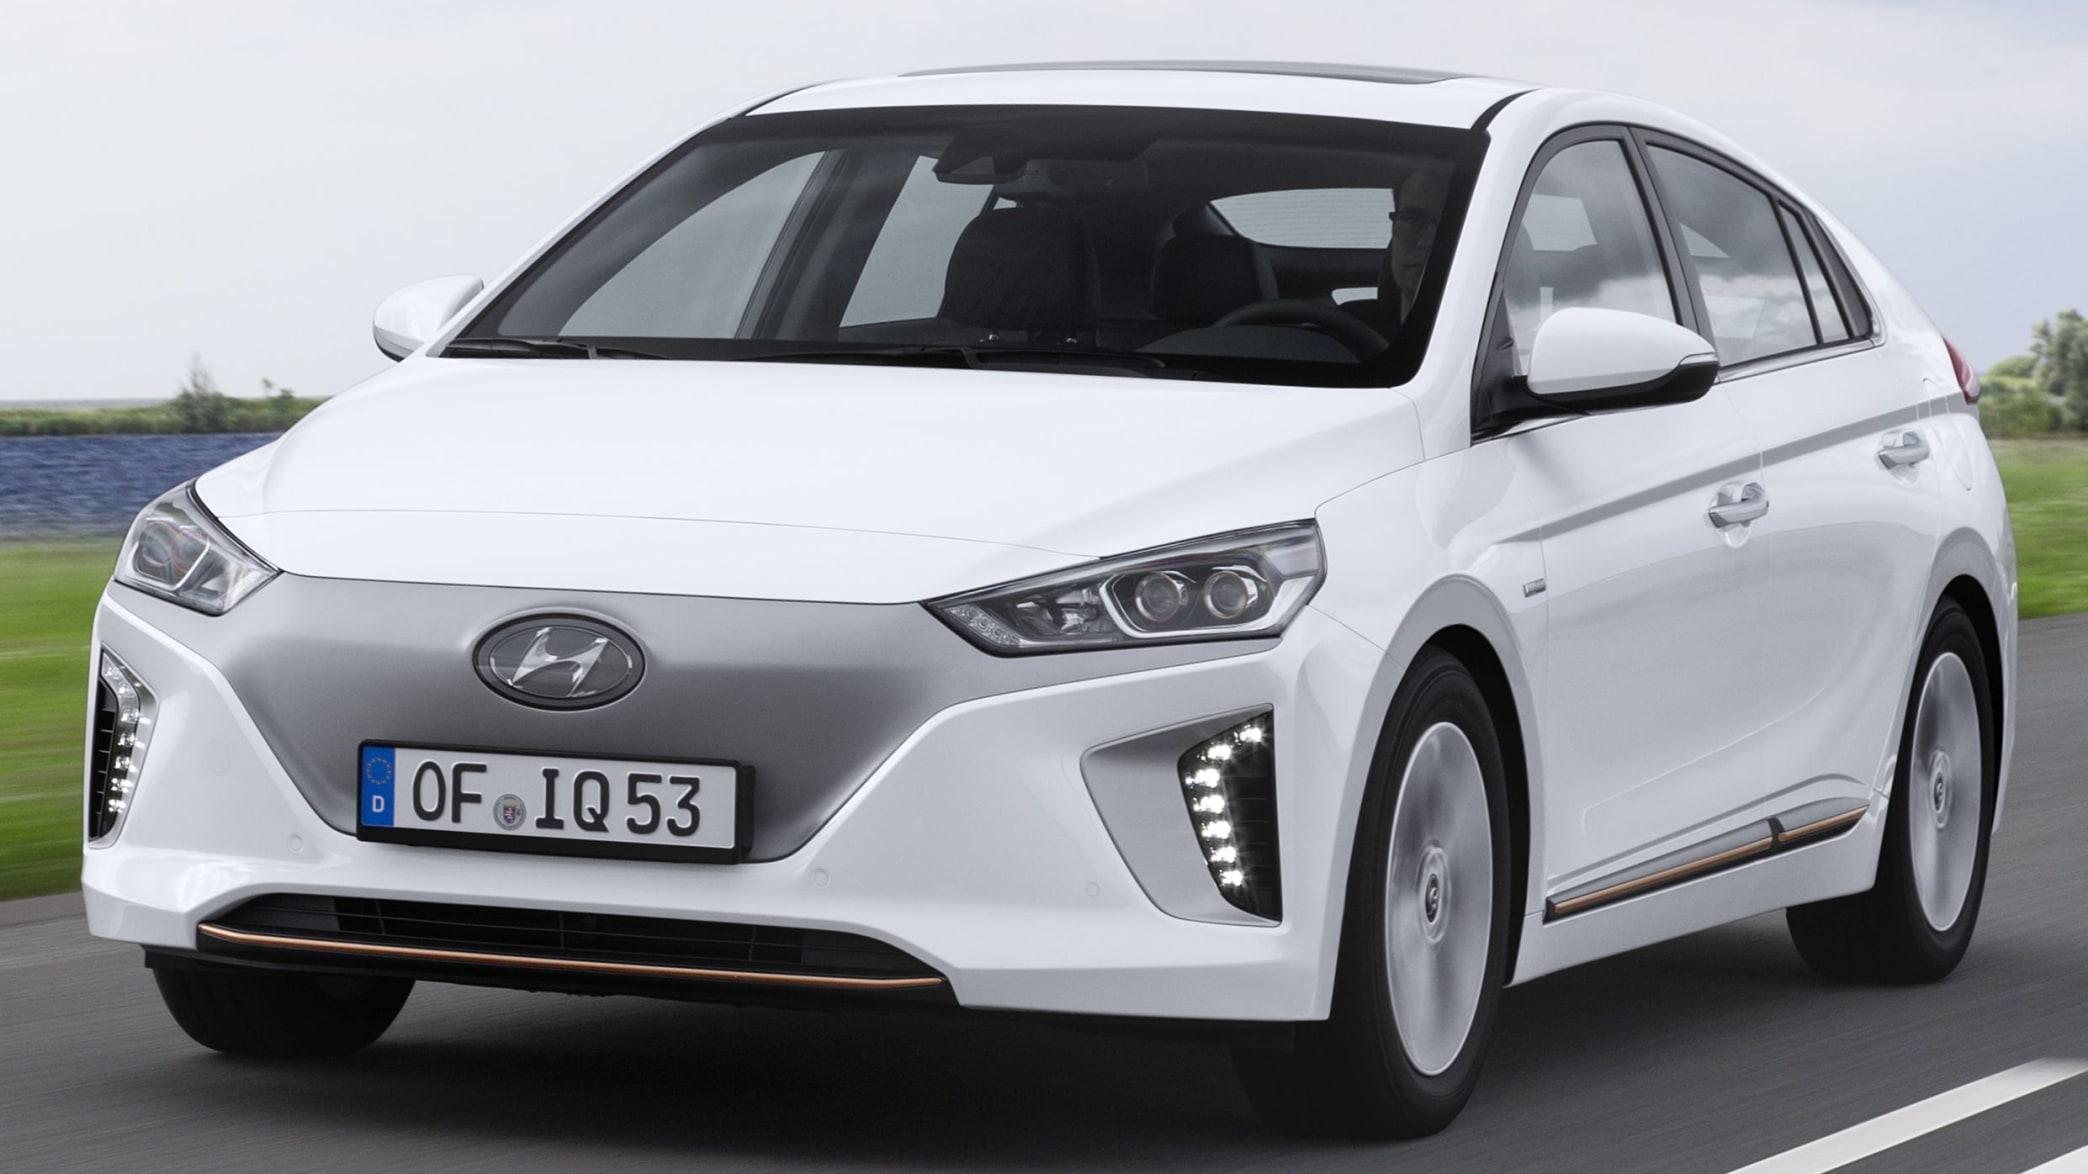 Hyundai Ioniq Electric fahrend auf der Straße